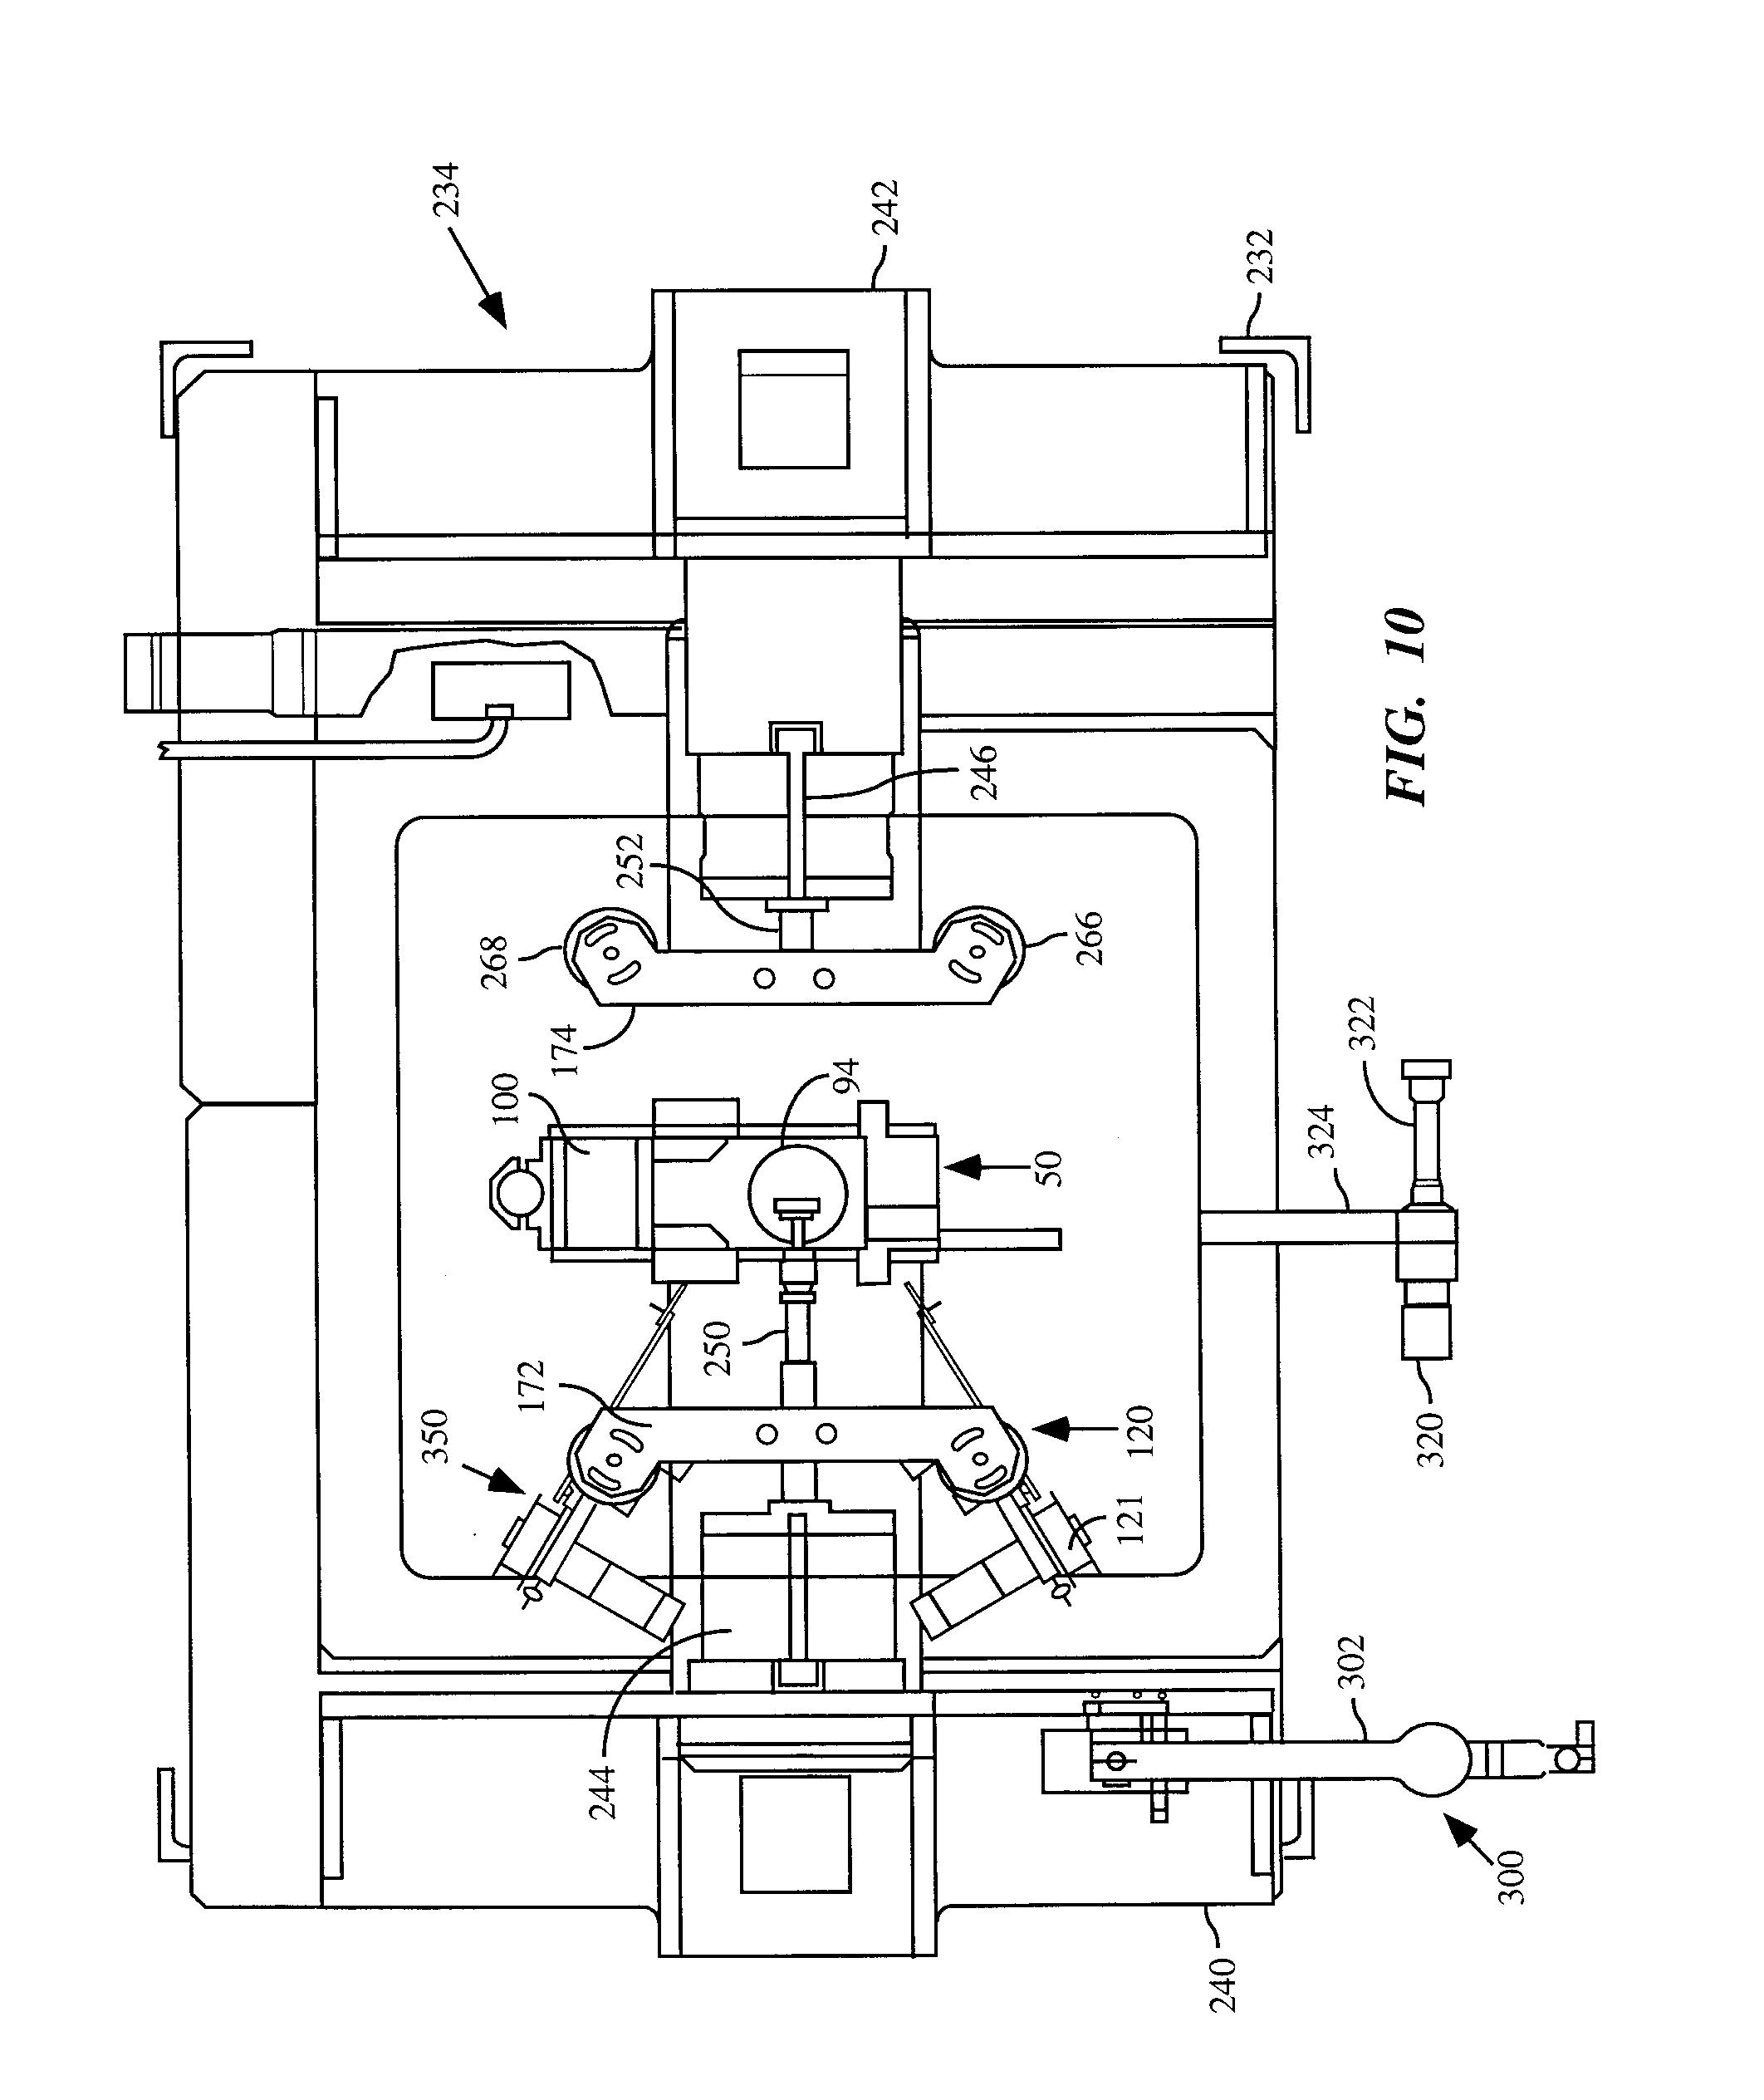 patent ep0663364a2